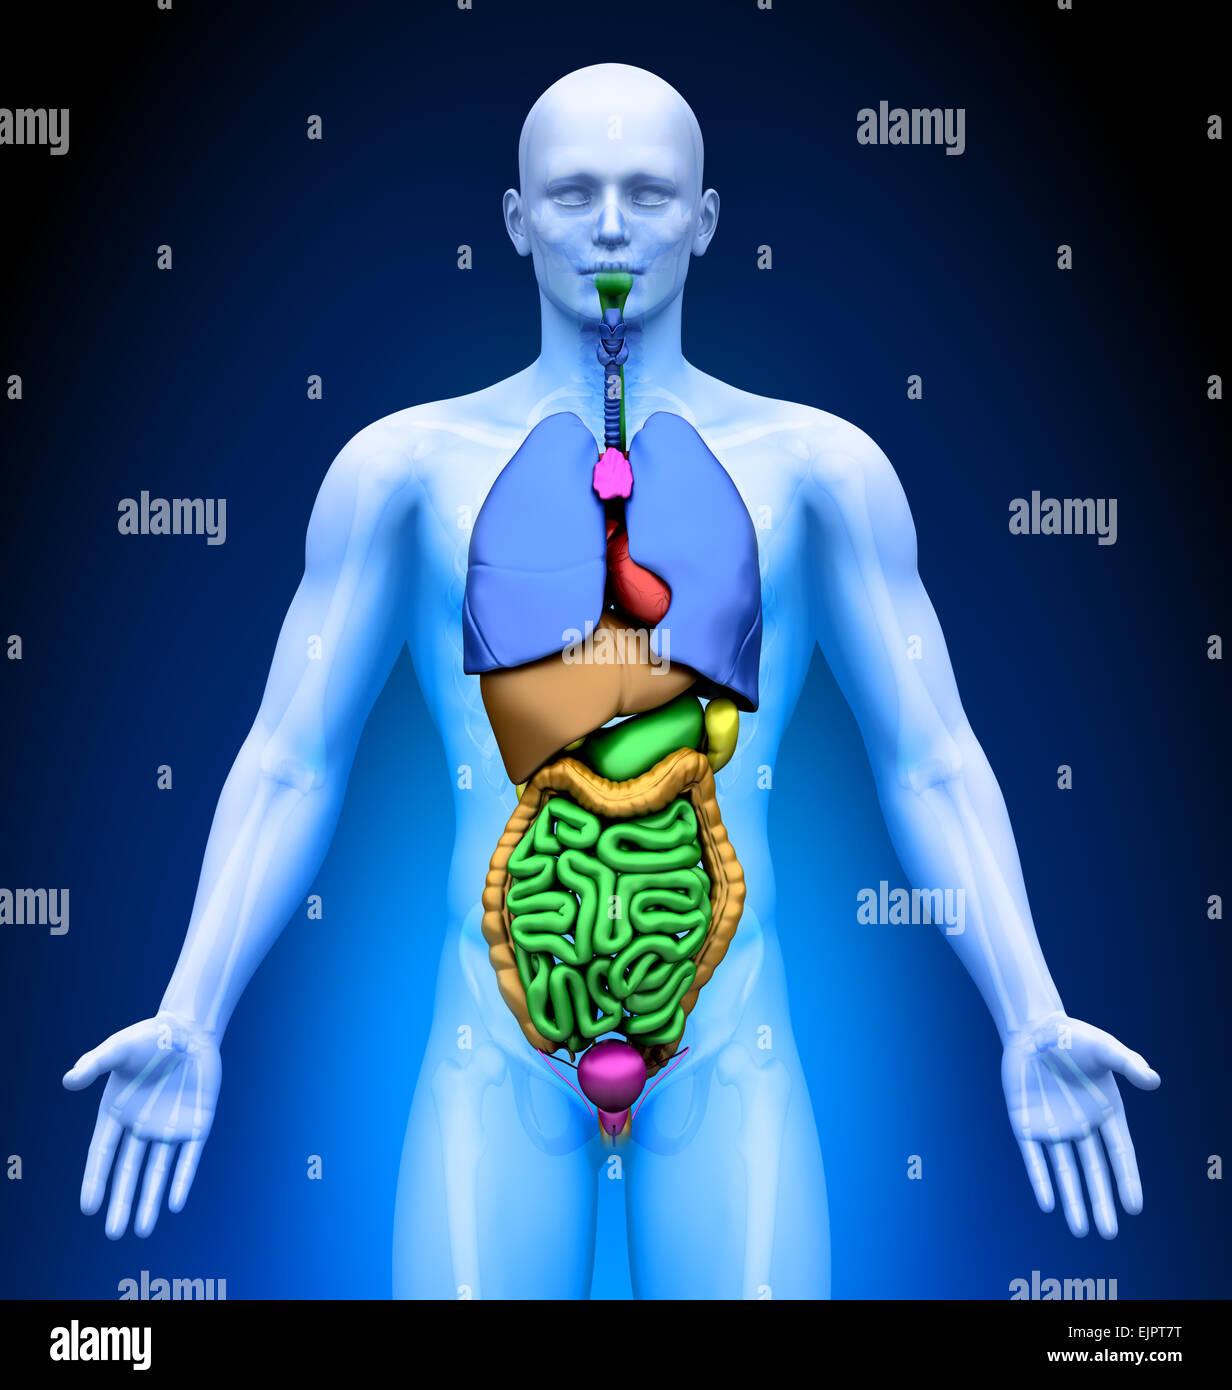 Male Internal Organs Anatomy Stock Photo 80407260 Alamy